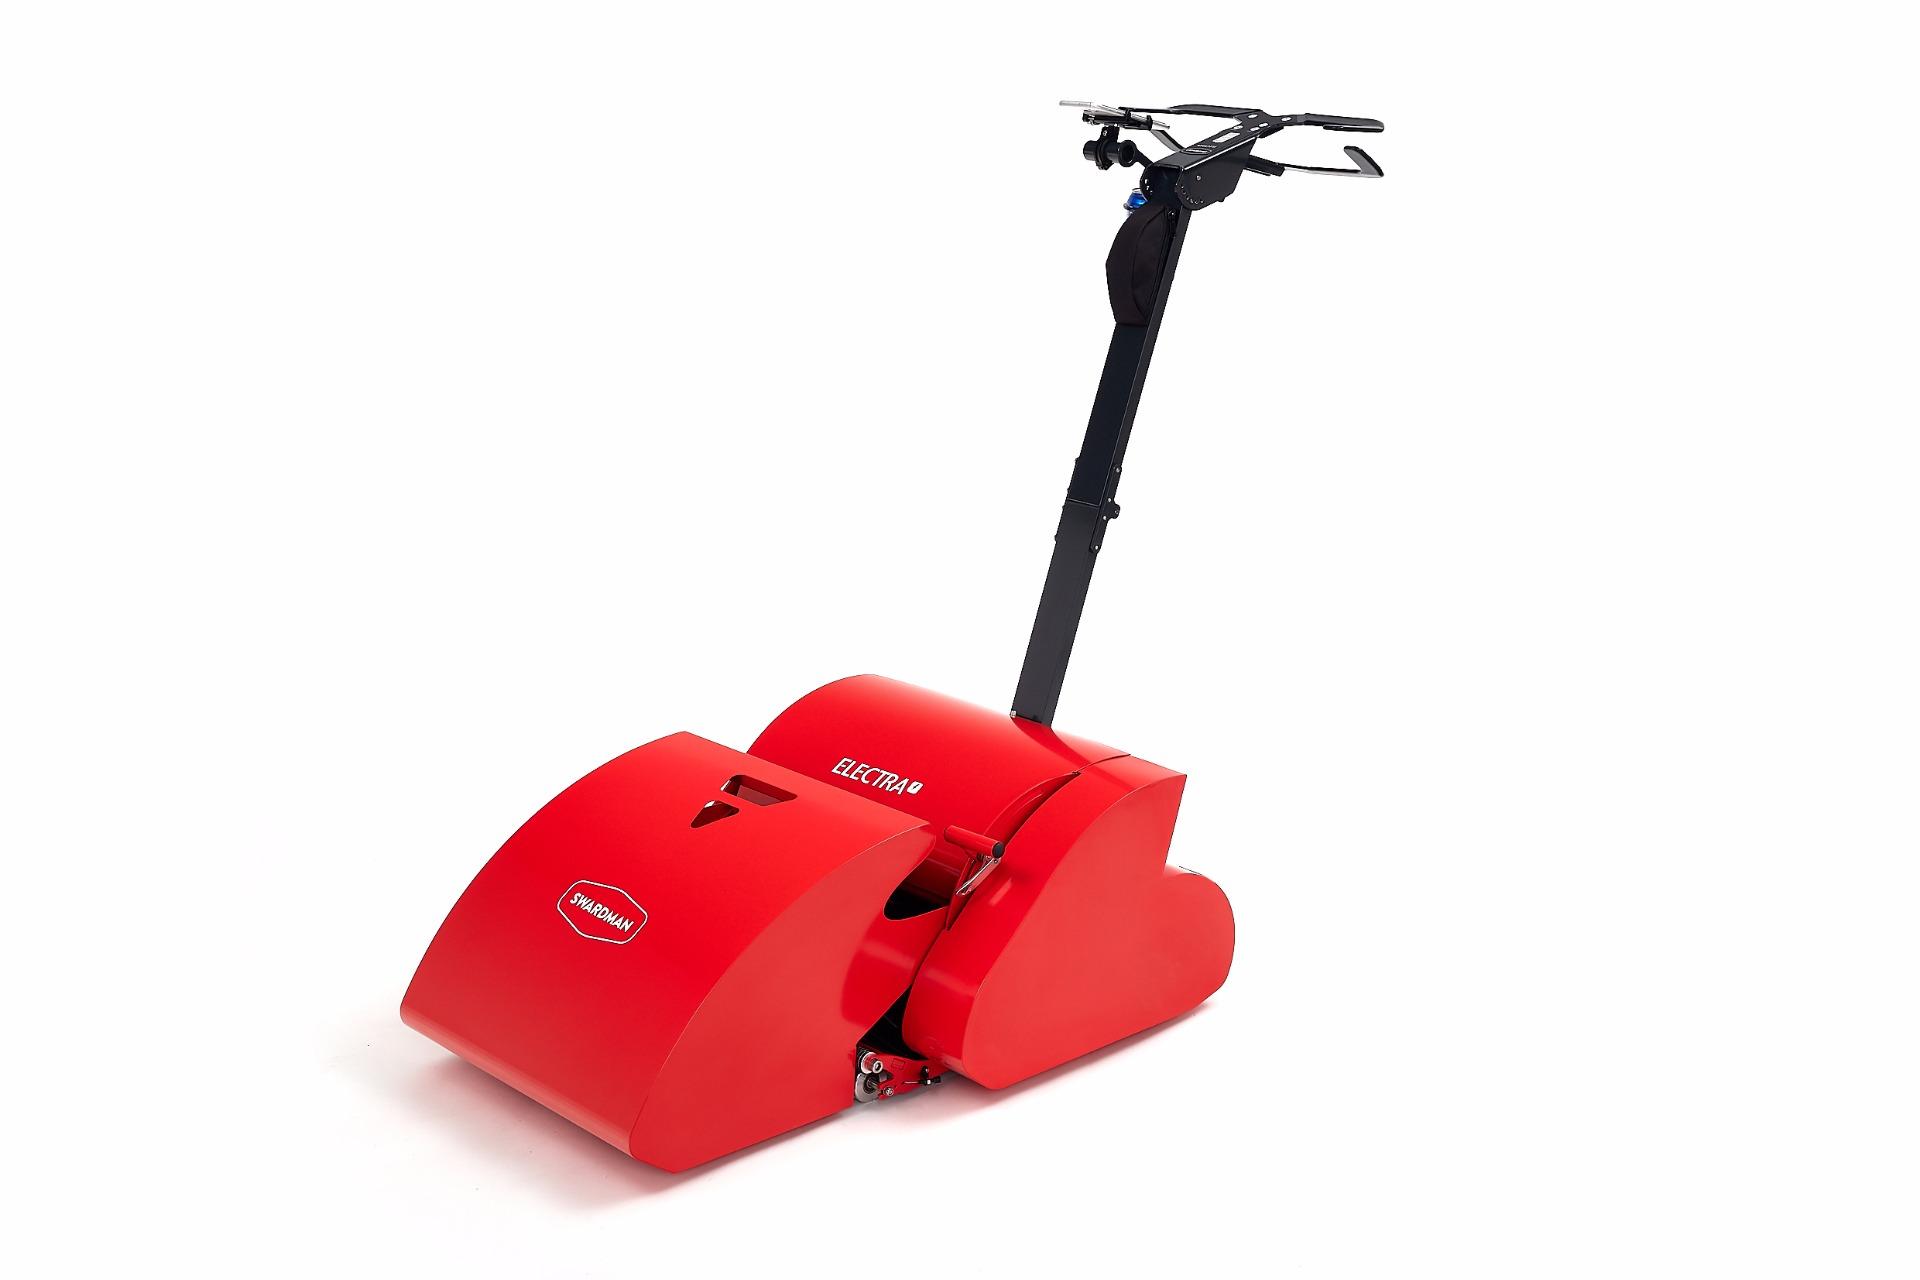 accu cordless model Electra reel lawn mower